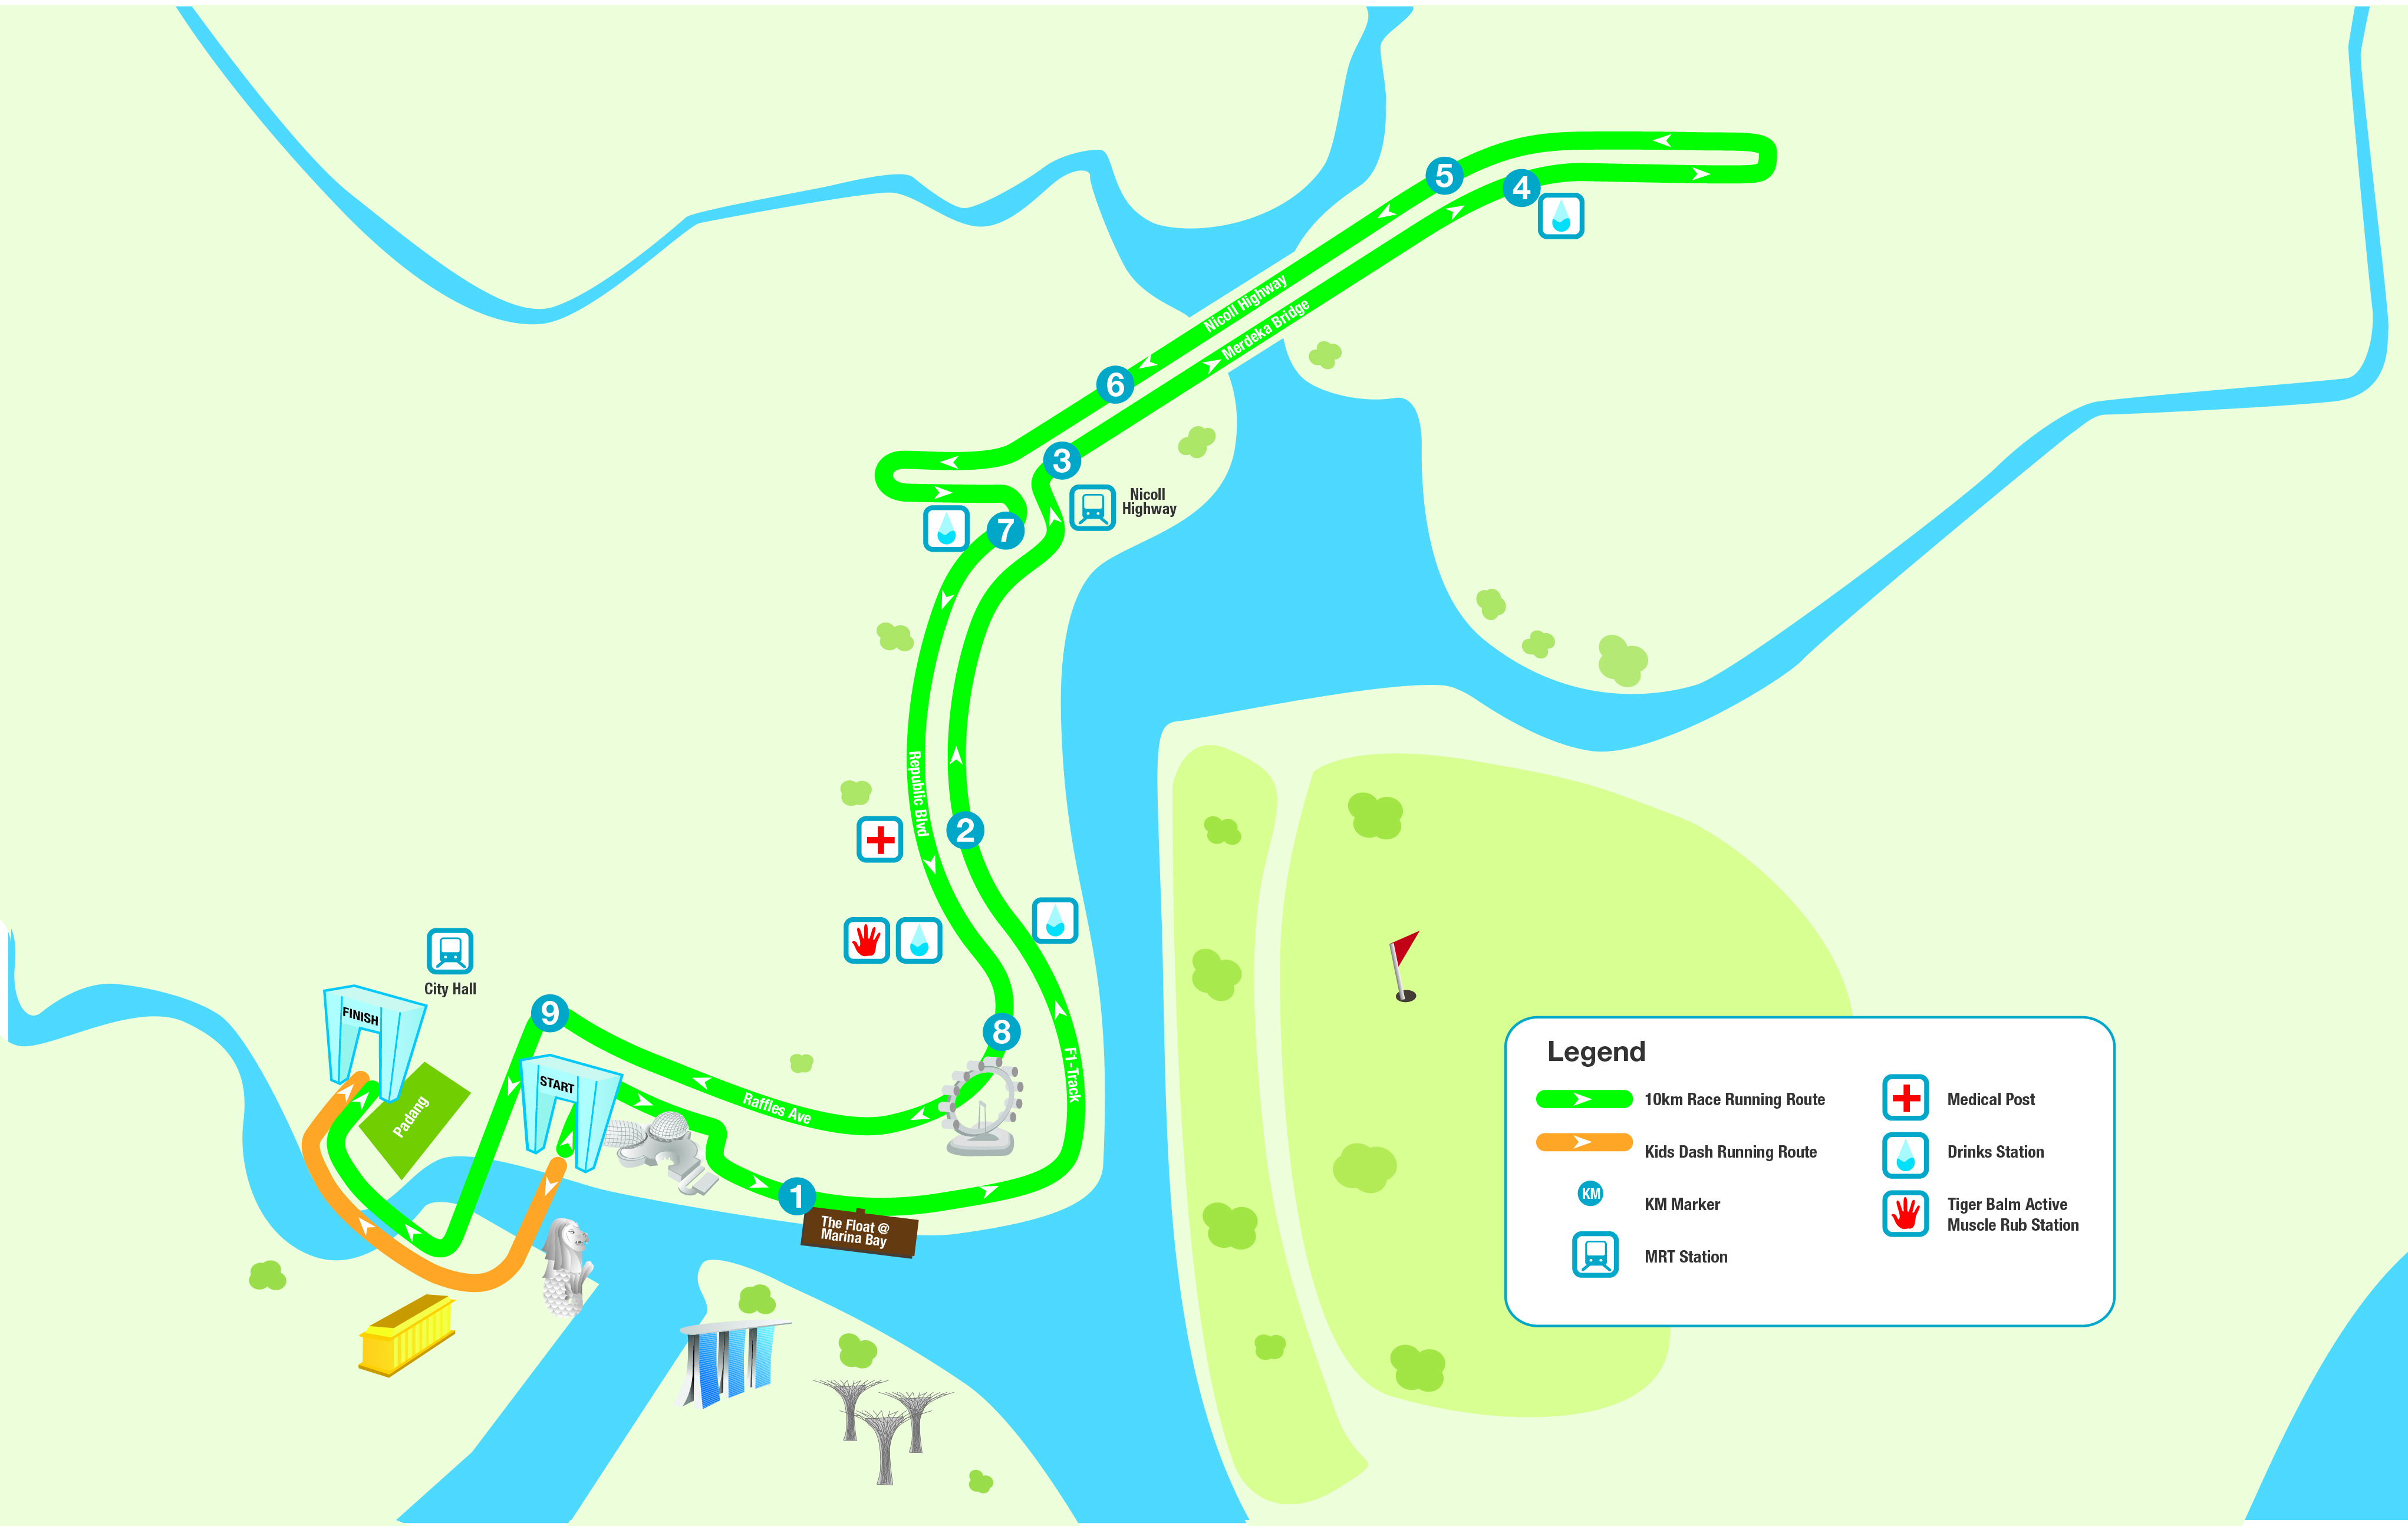 10km route map standard chartered singapore marathon